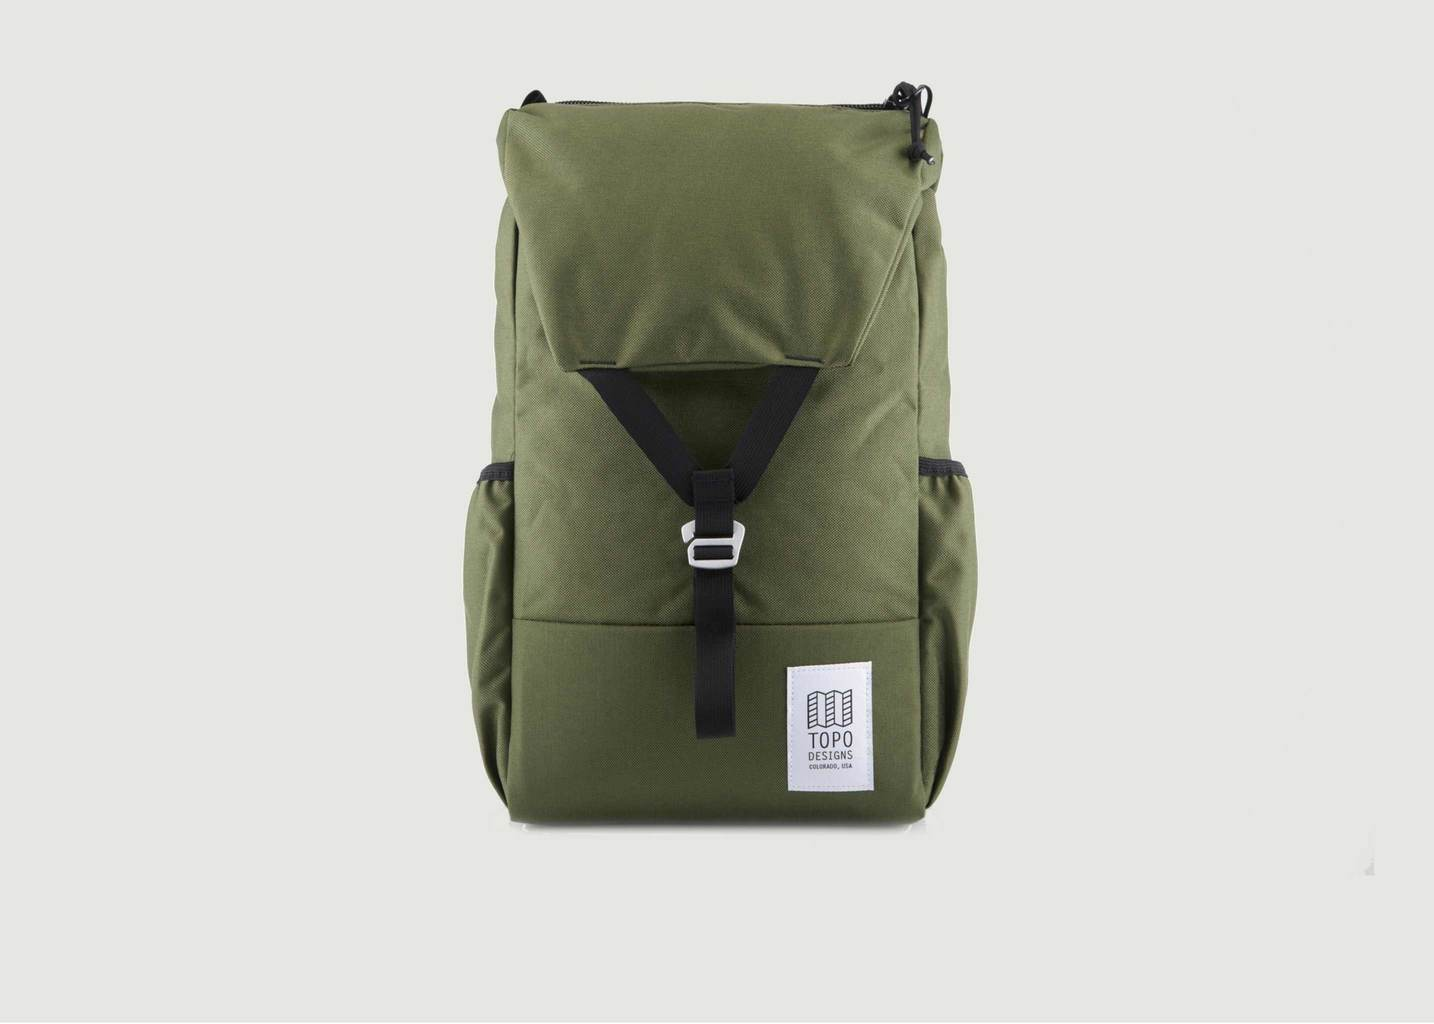 Sac à dos Y-pack - Topo Designs